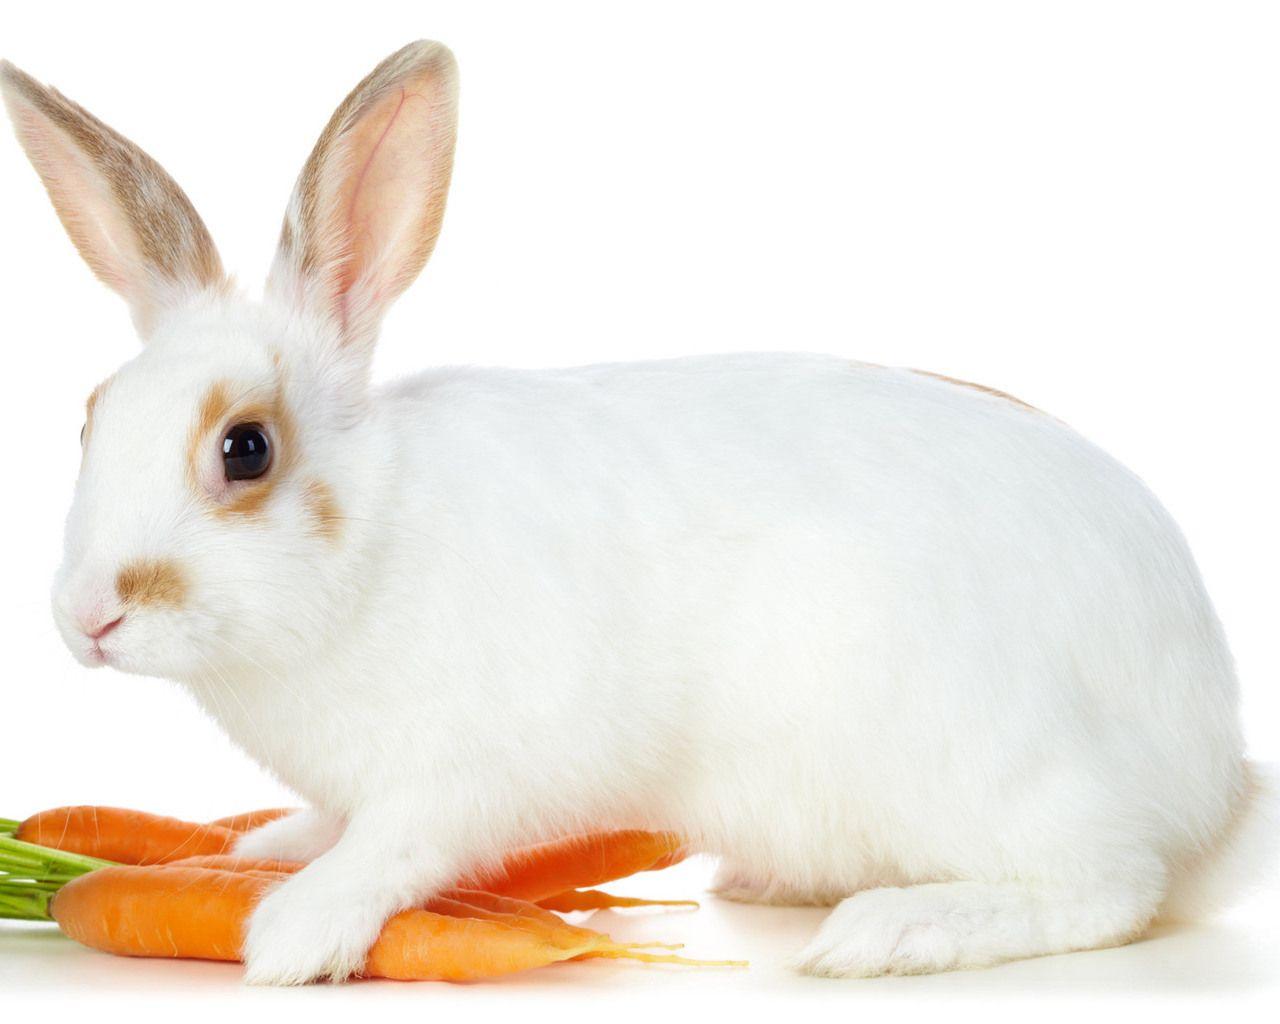 A Rabbit Named Cleo Rabbit Pictures Rabbit Wallpaper Animals